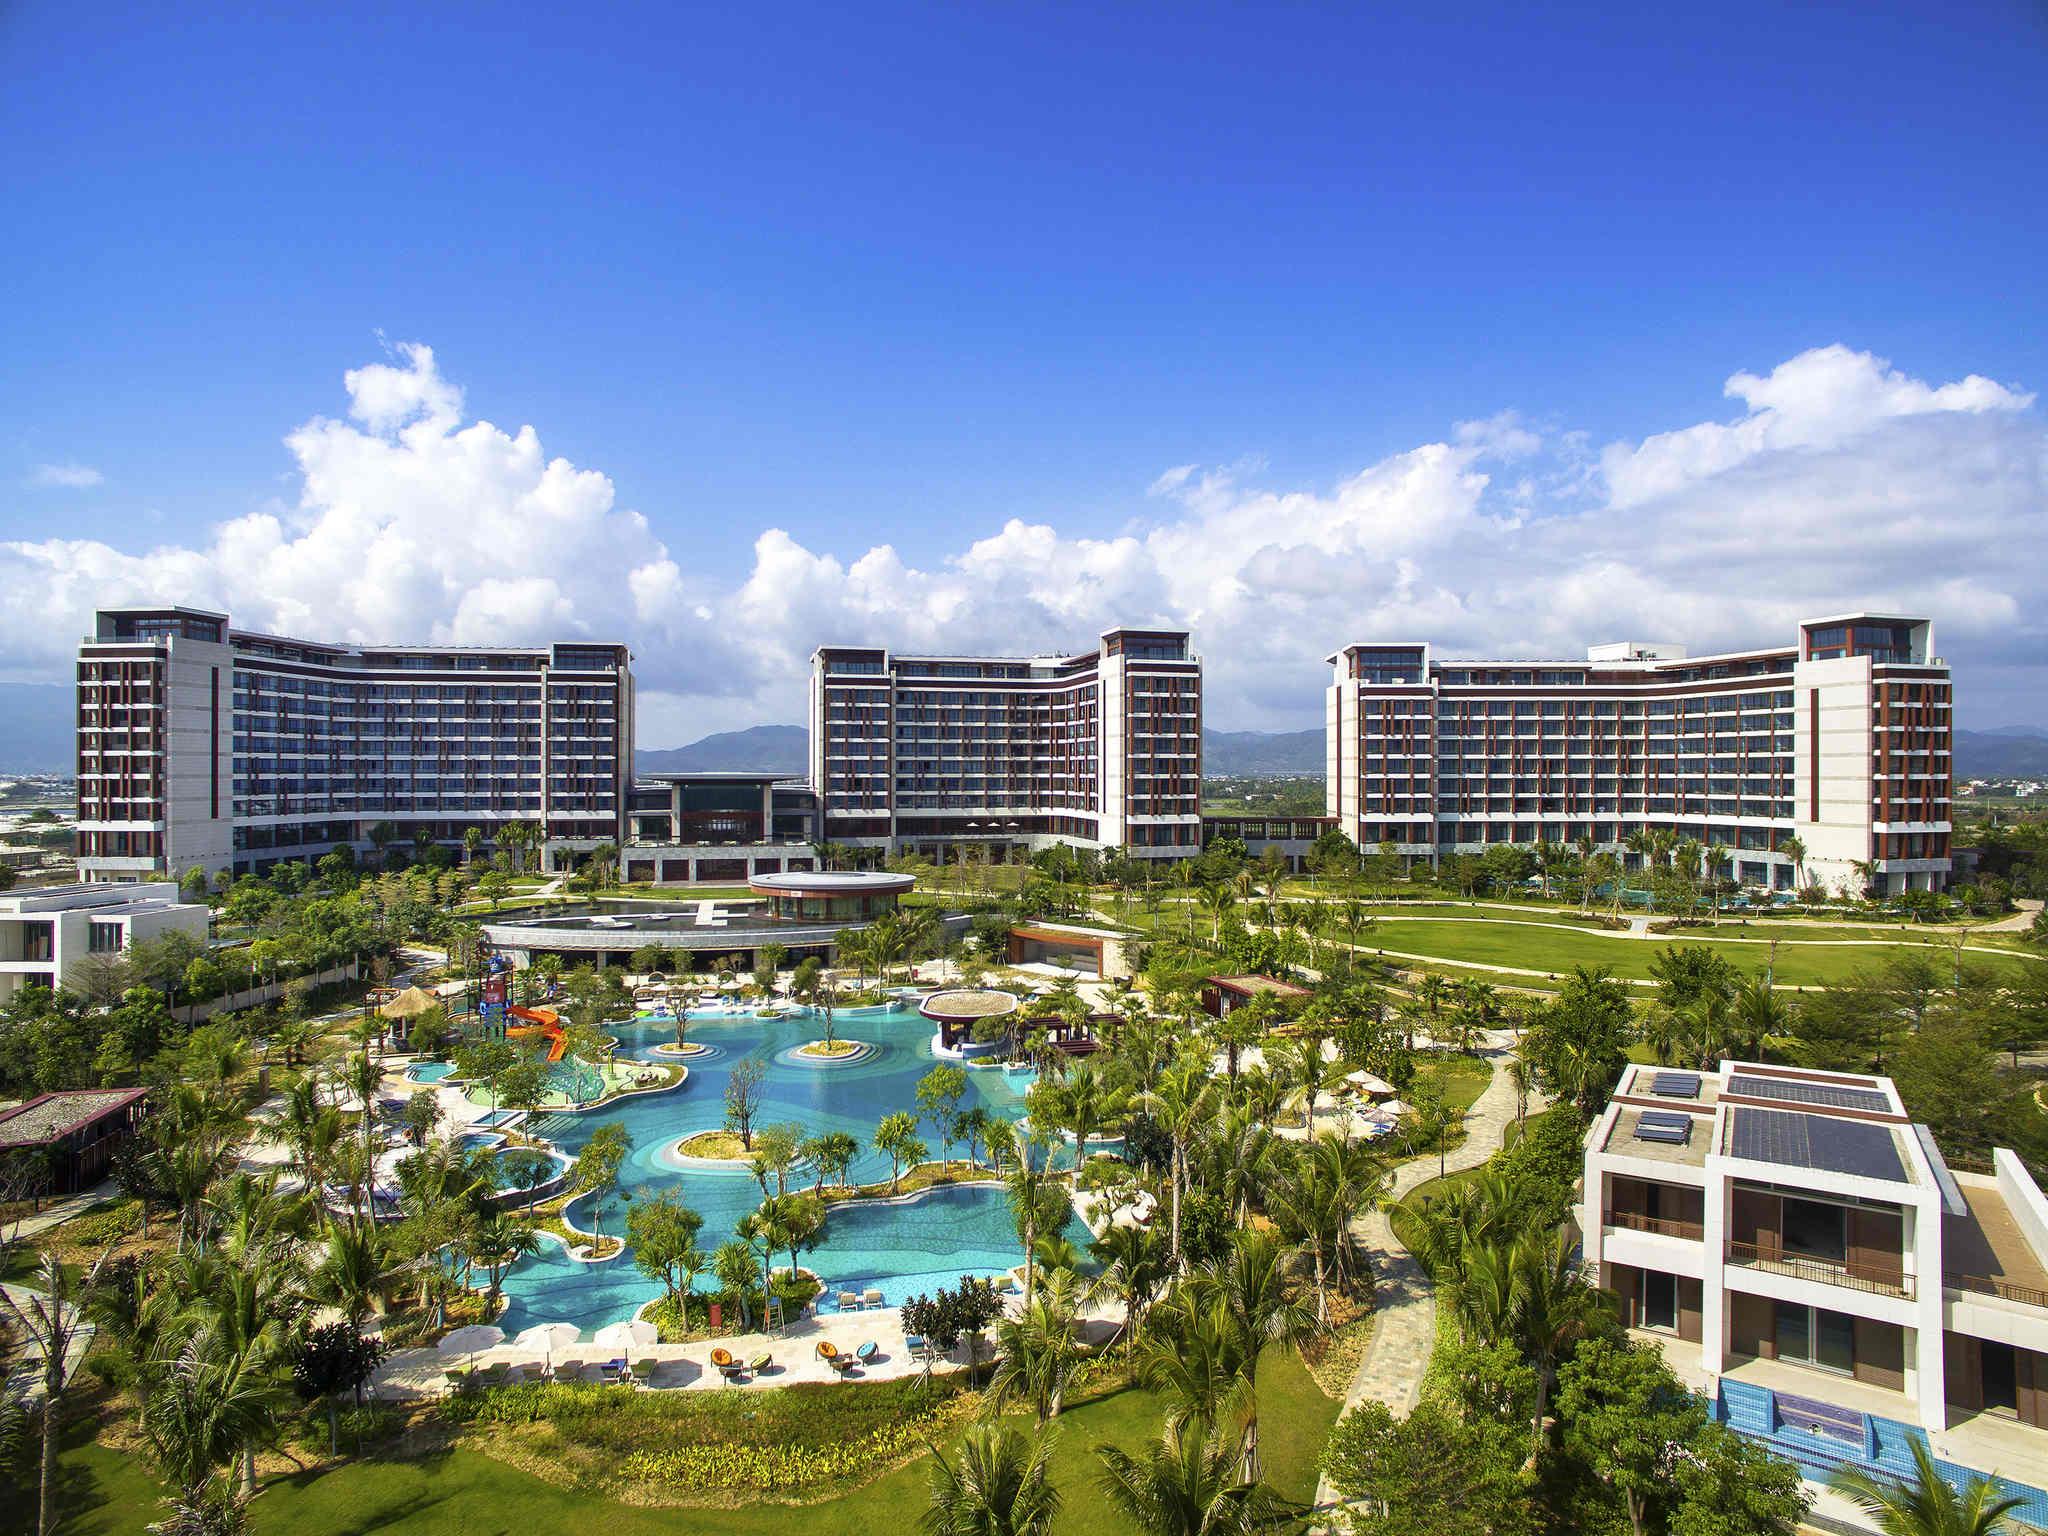 Hotel – Sofitel Sanya Leeman